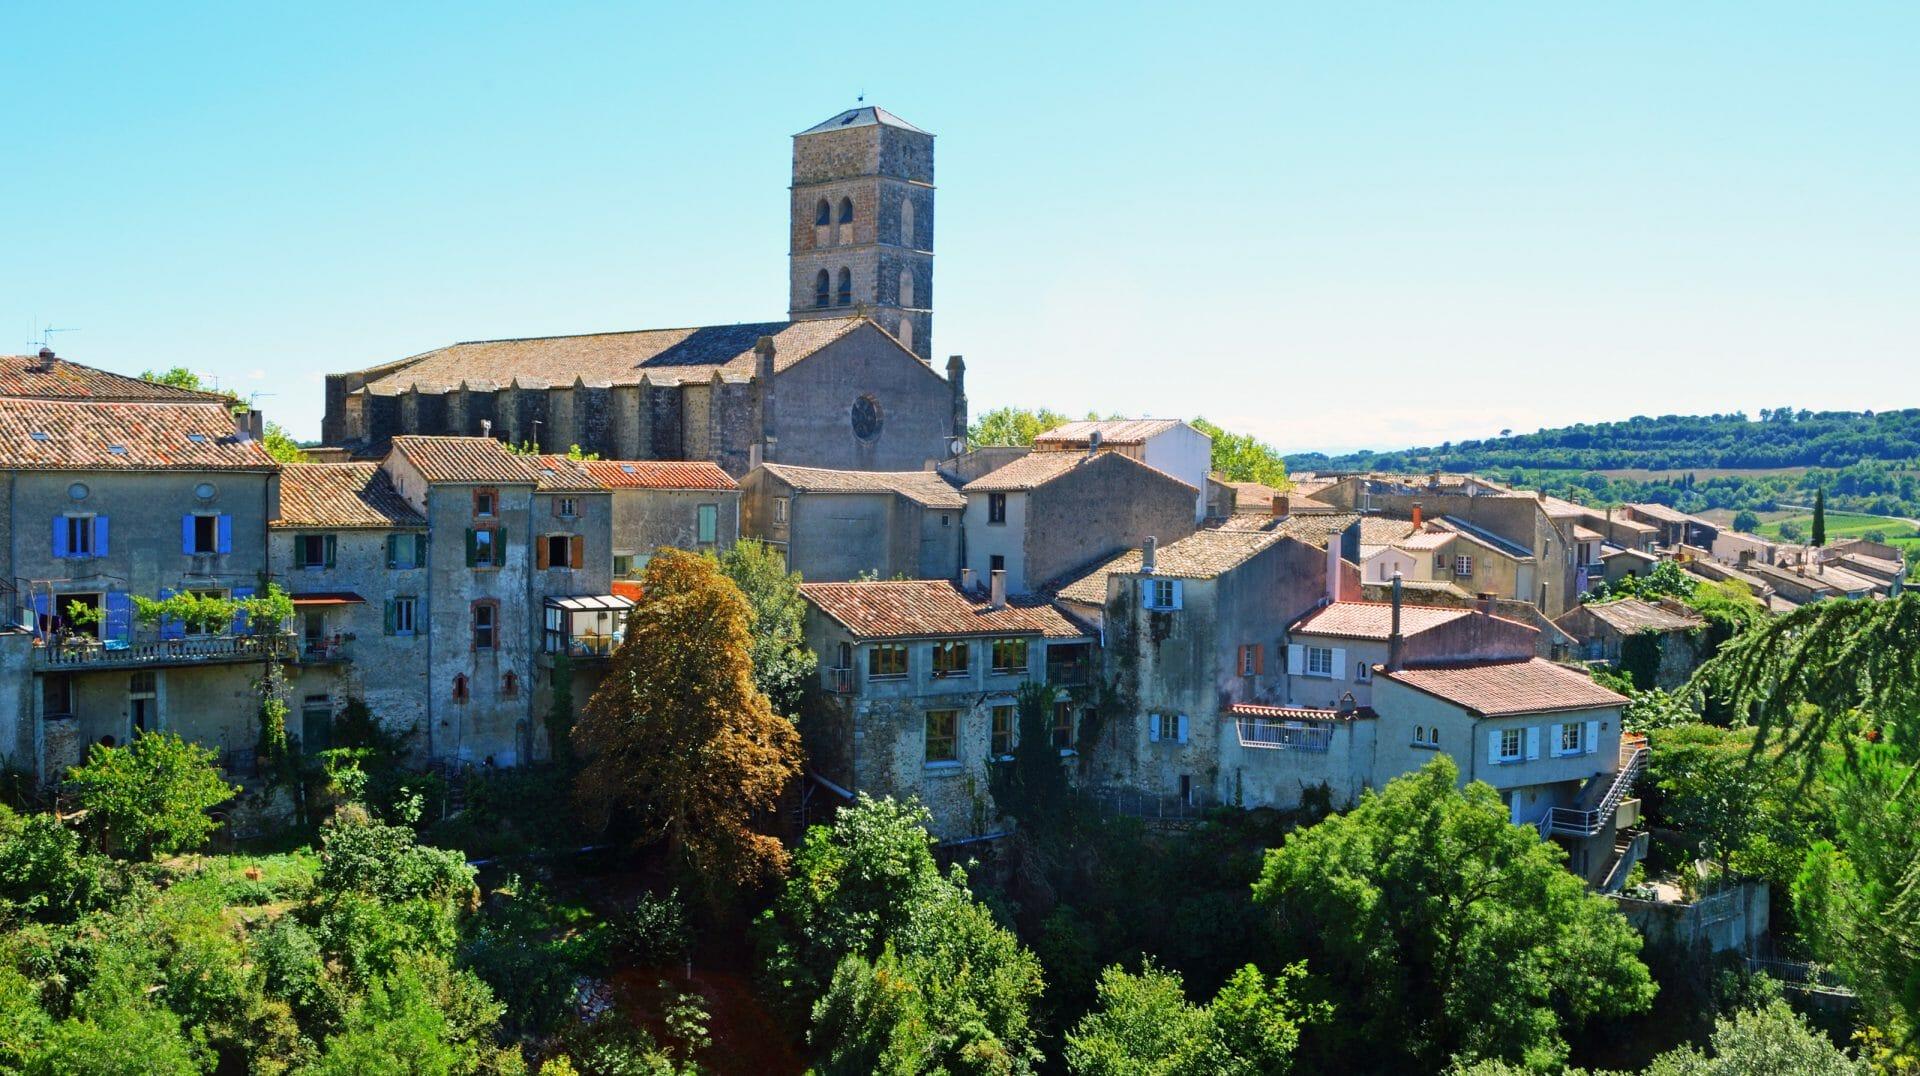 AviewofthevillageofMontolieuAudeLanguedoc RoussillonFrance.Treesvalleyancienthousesandchurchbelltower.